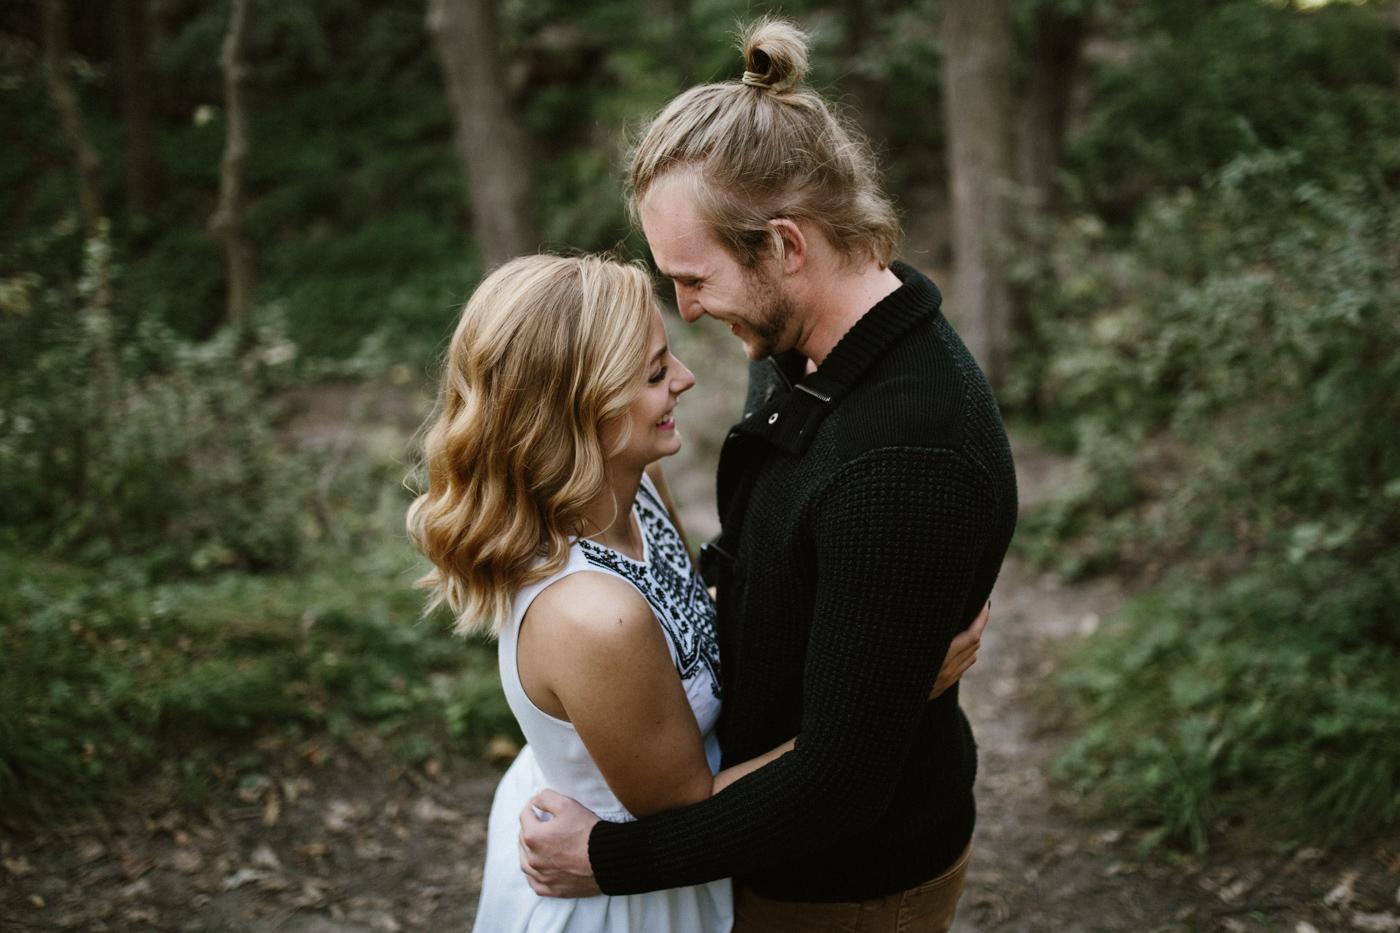 Sioux_Falls_Des_Moines_Engagement_Wedding_Photographer_05.jpg